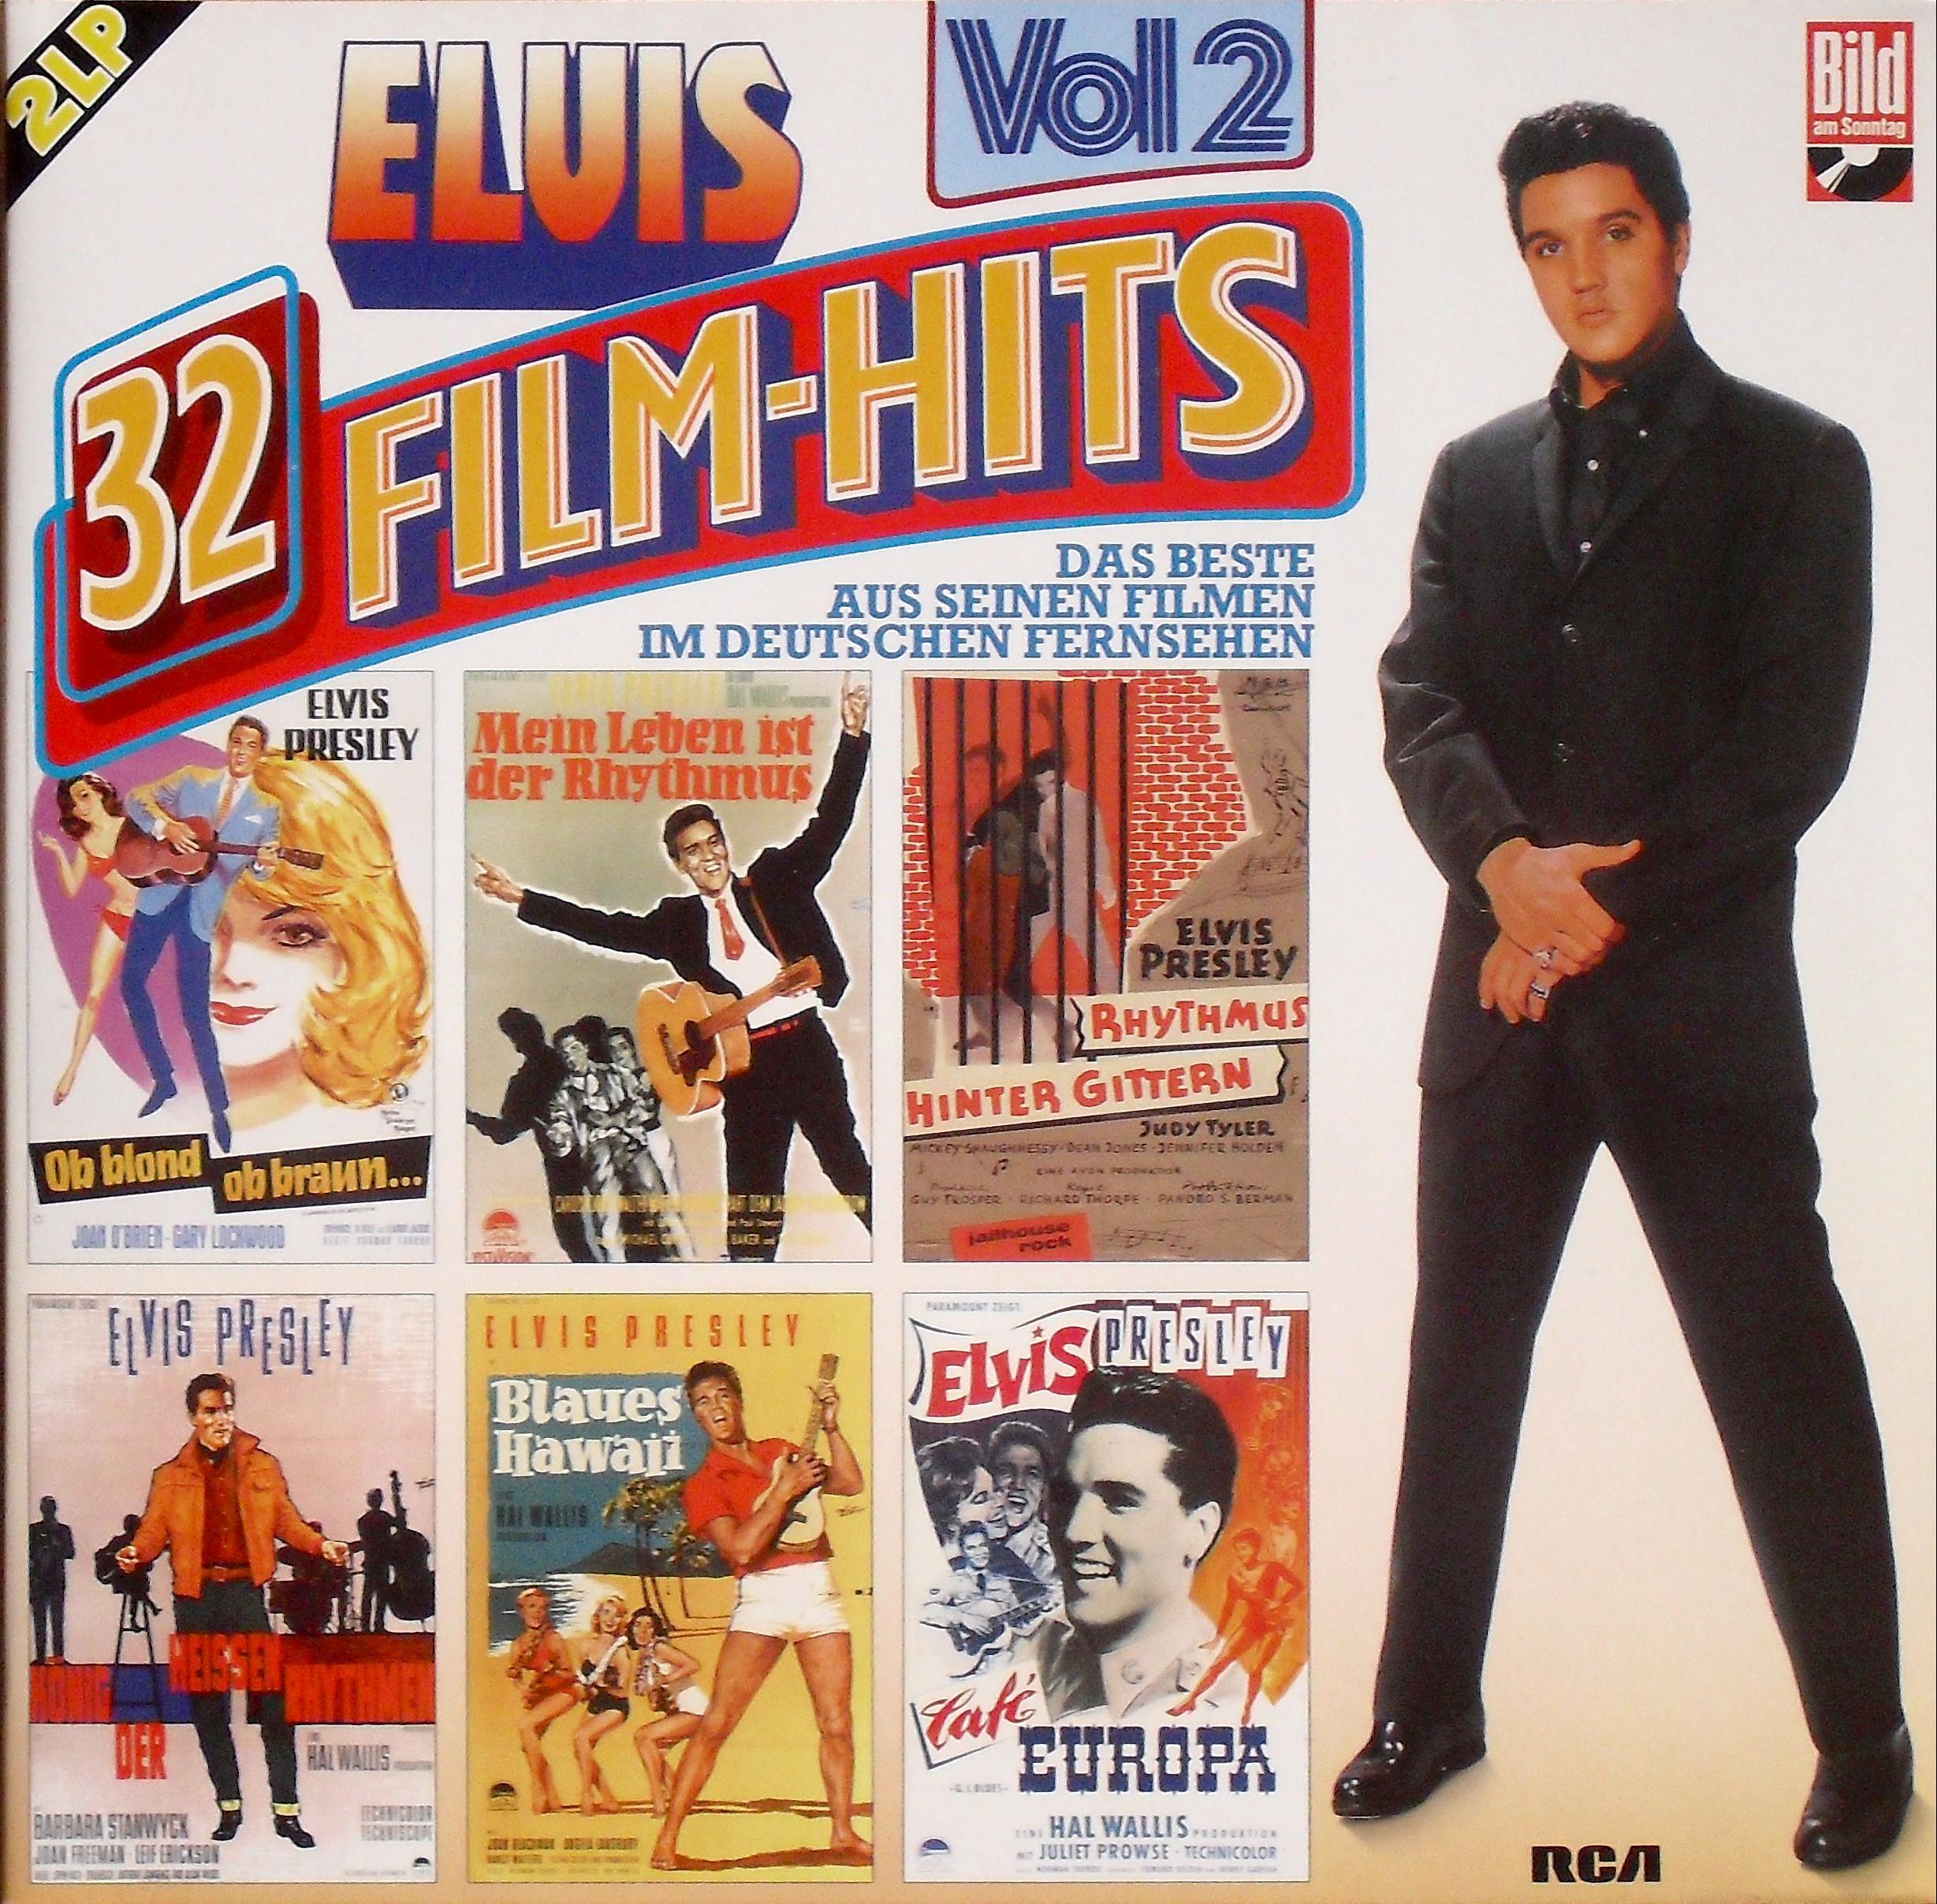 32 FILM HITS Vol. 2 0176uwf